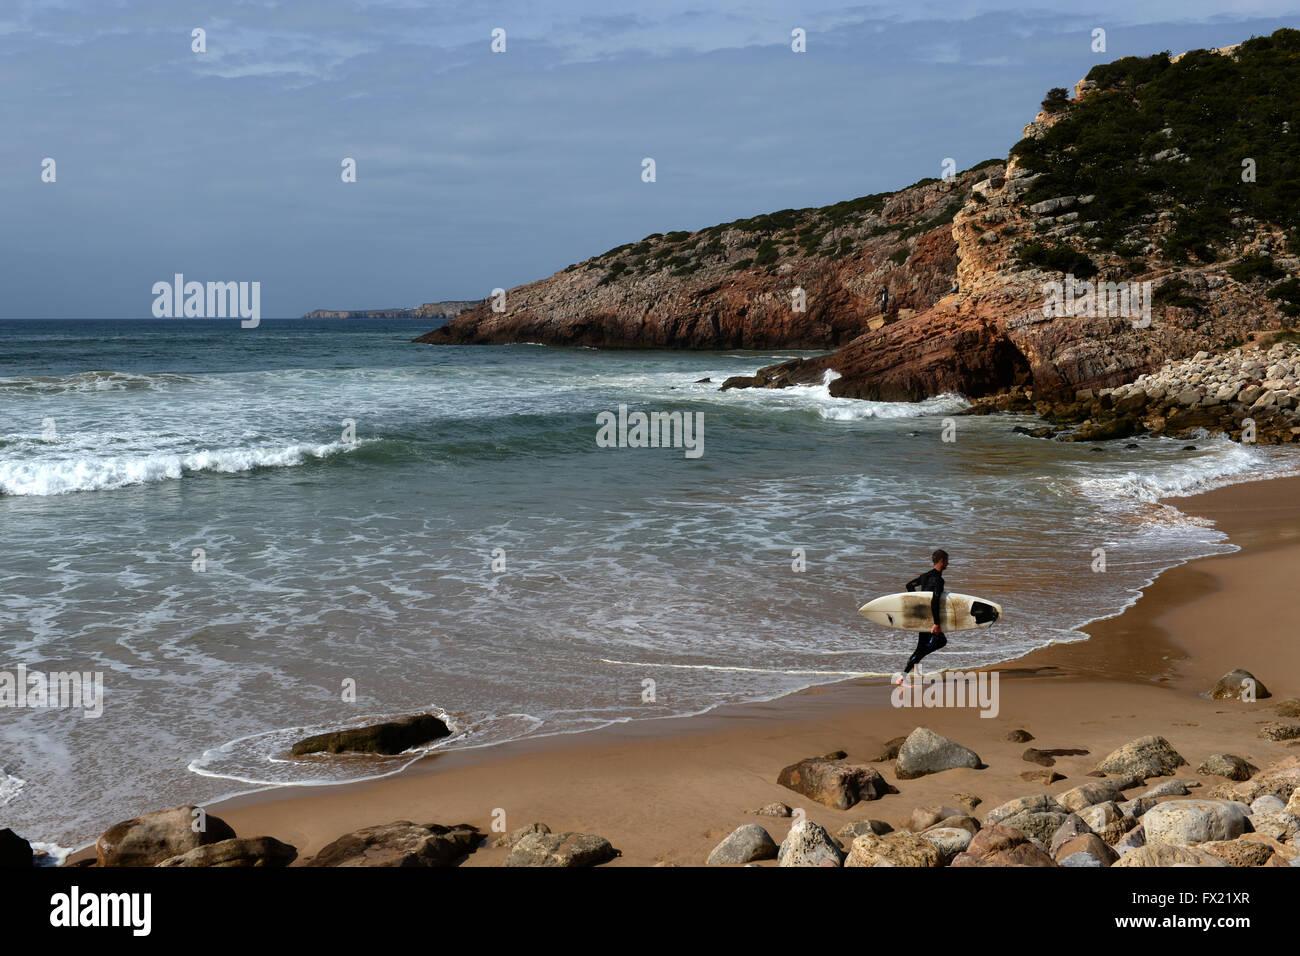 beaches and coastline of the Algarve , Portugal - Stock Image